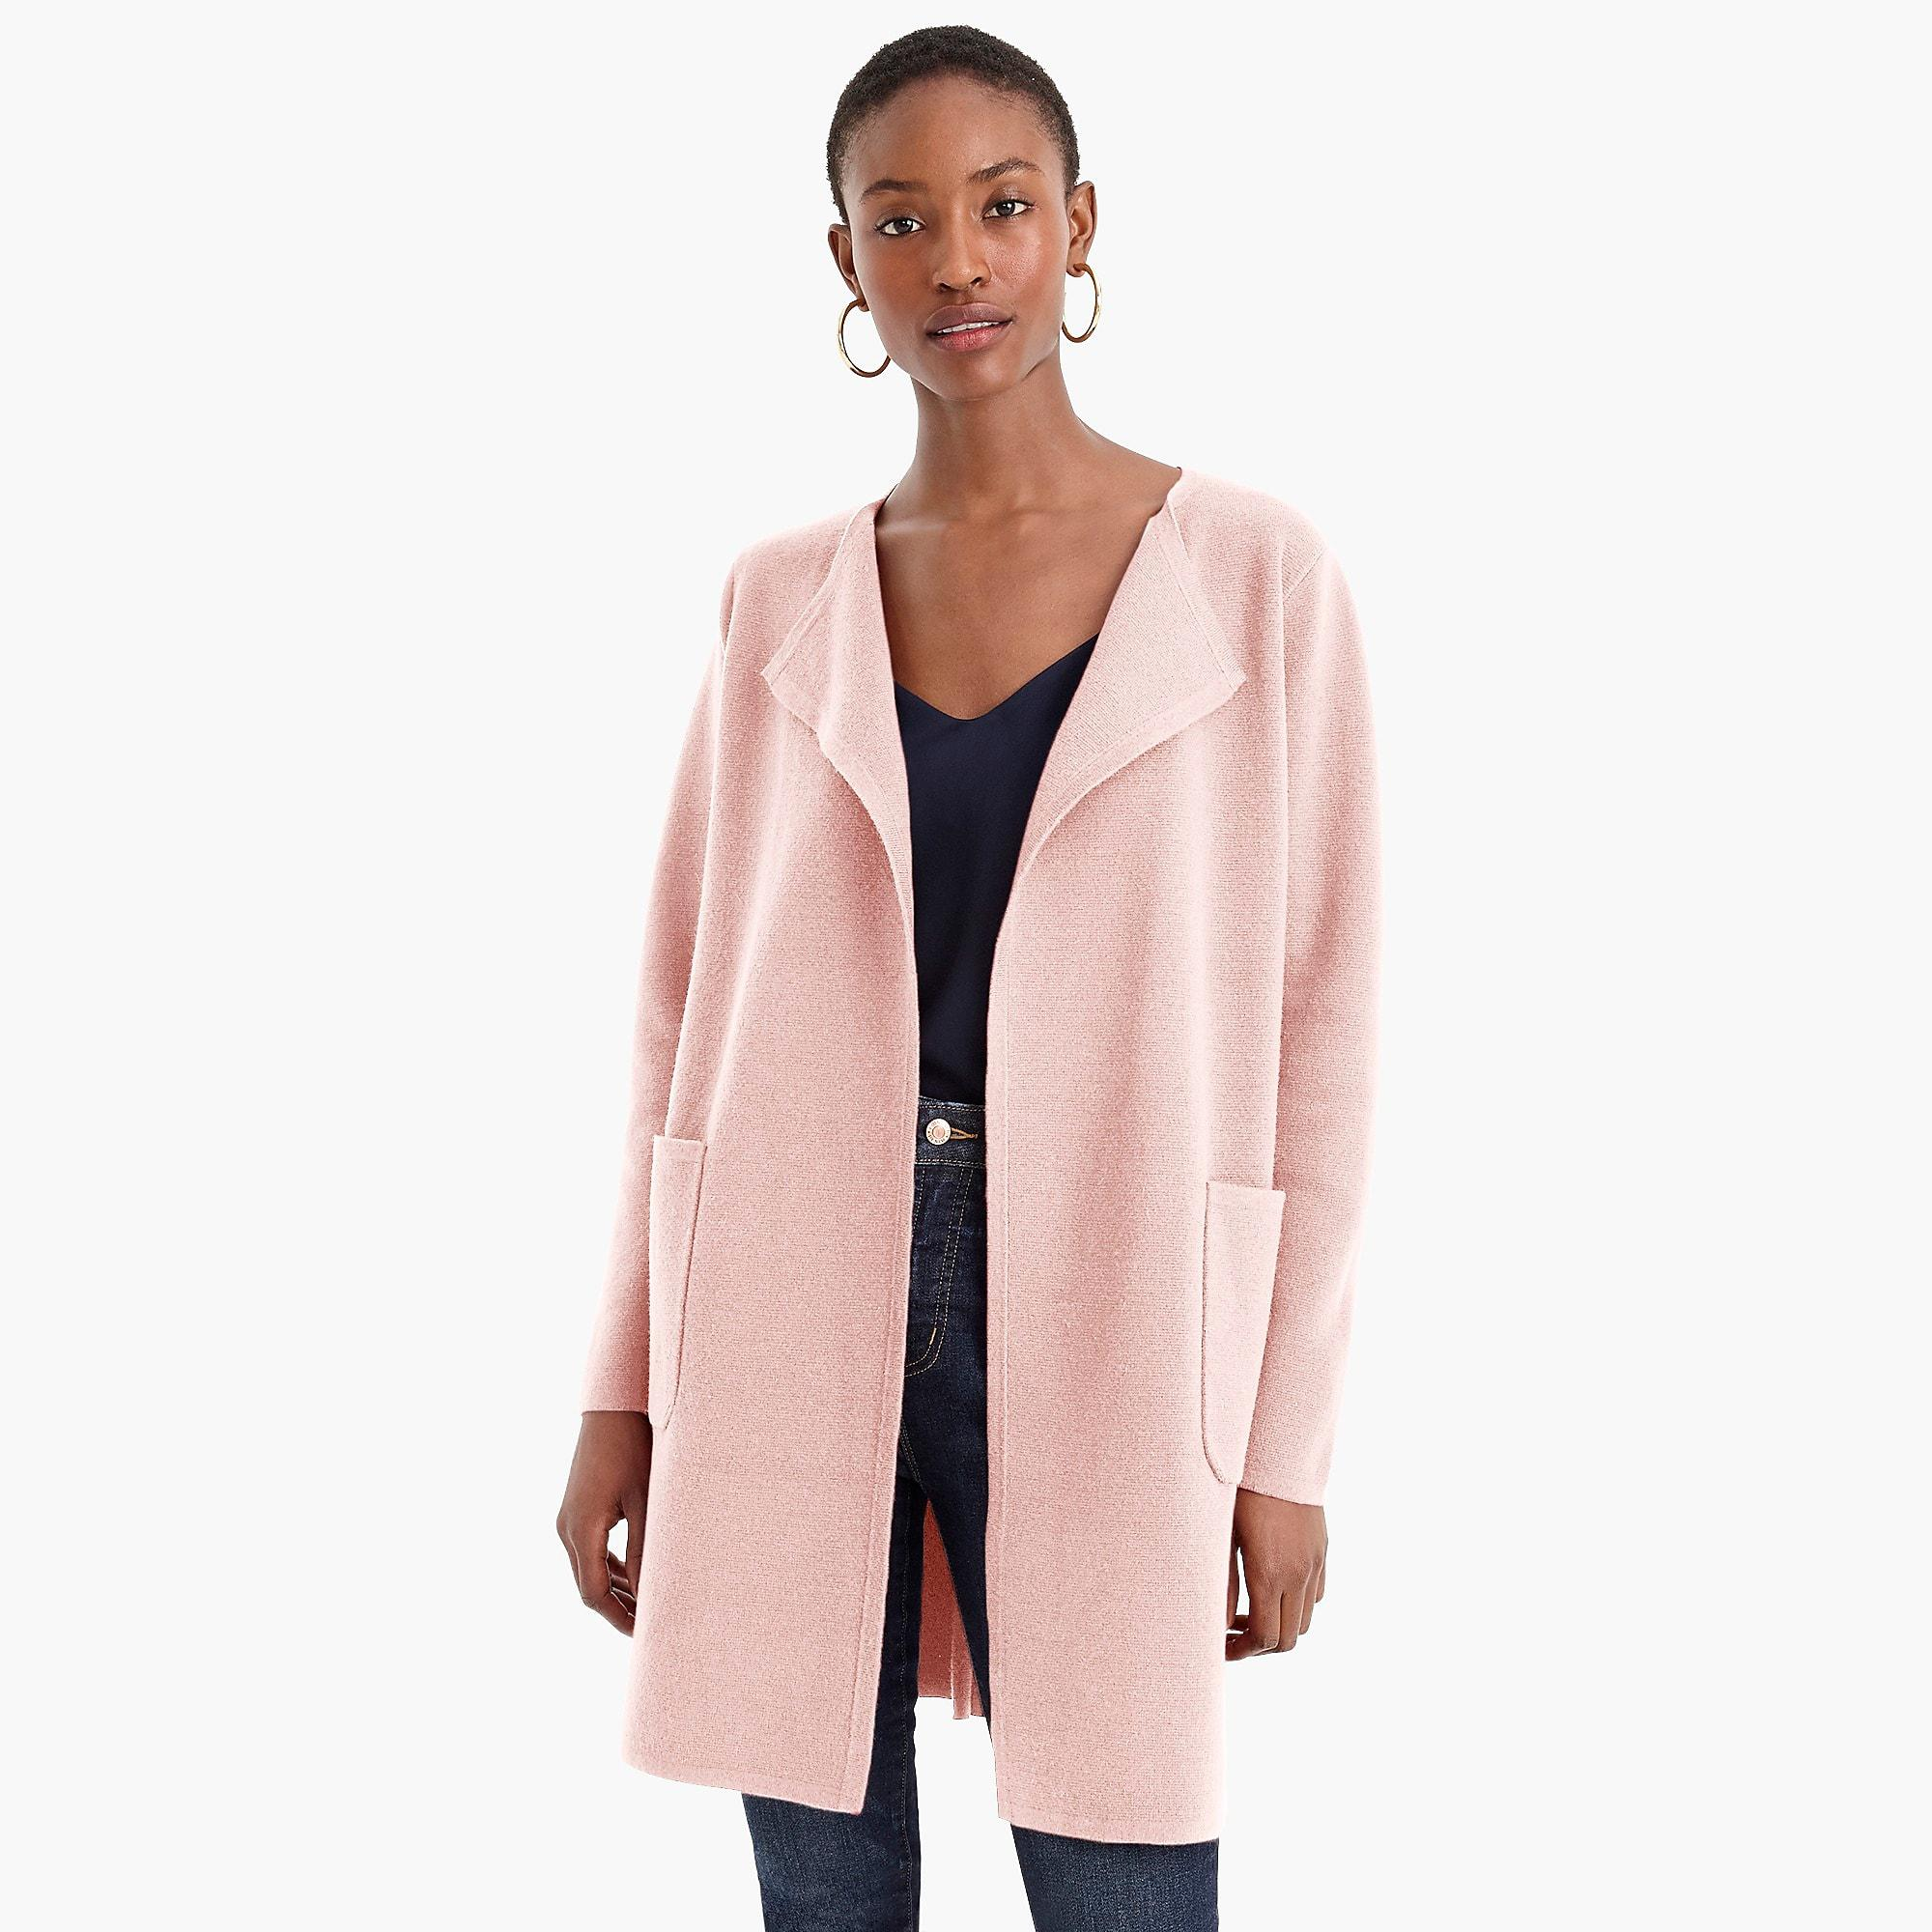 aada714f22 Lyst - J.Crew Juliette Collarless Sweater-blazer in Pink